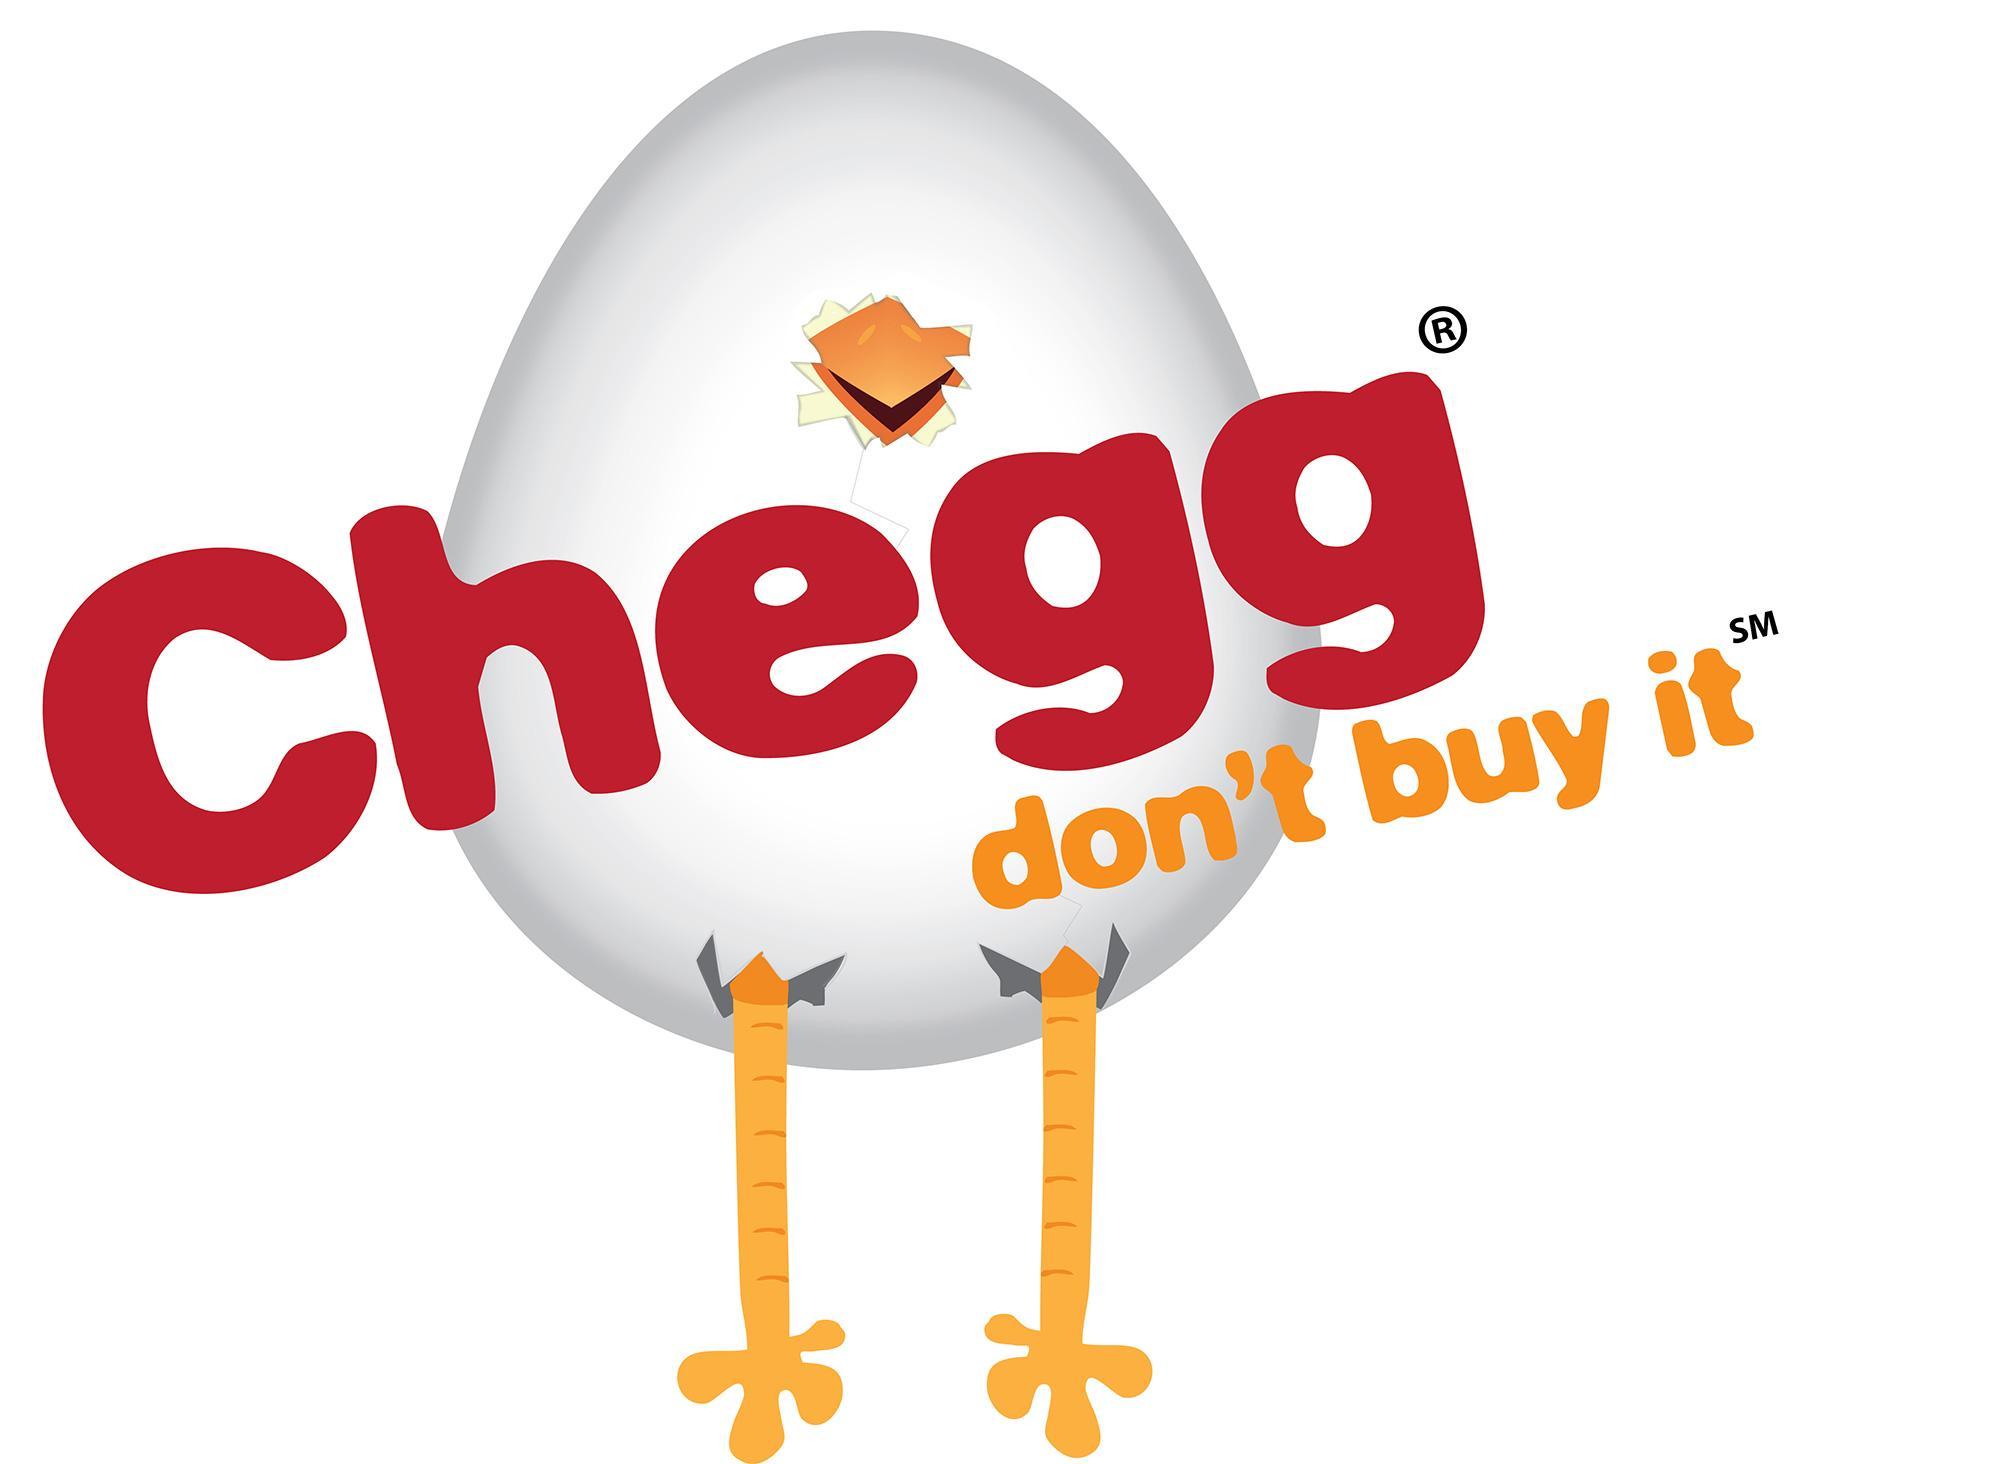 Chegg: Time To Take Your Profits - Chegg, Inc. (NYSE:CHGG ...